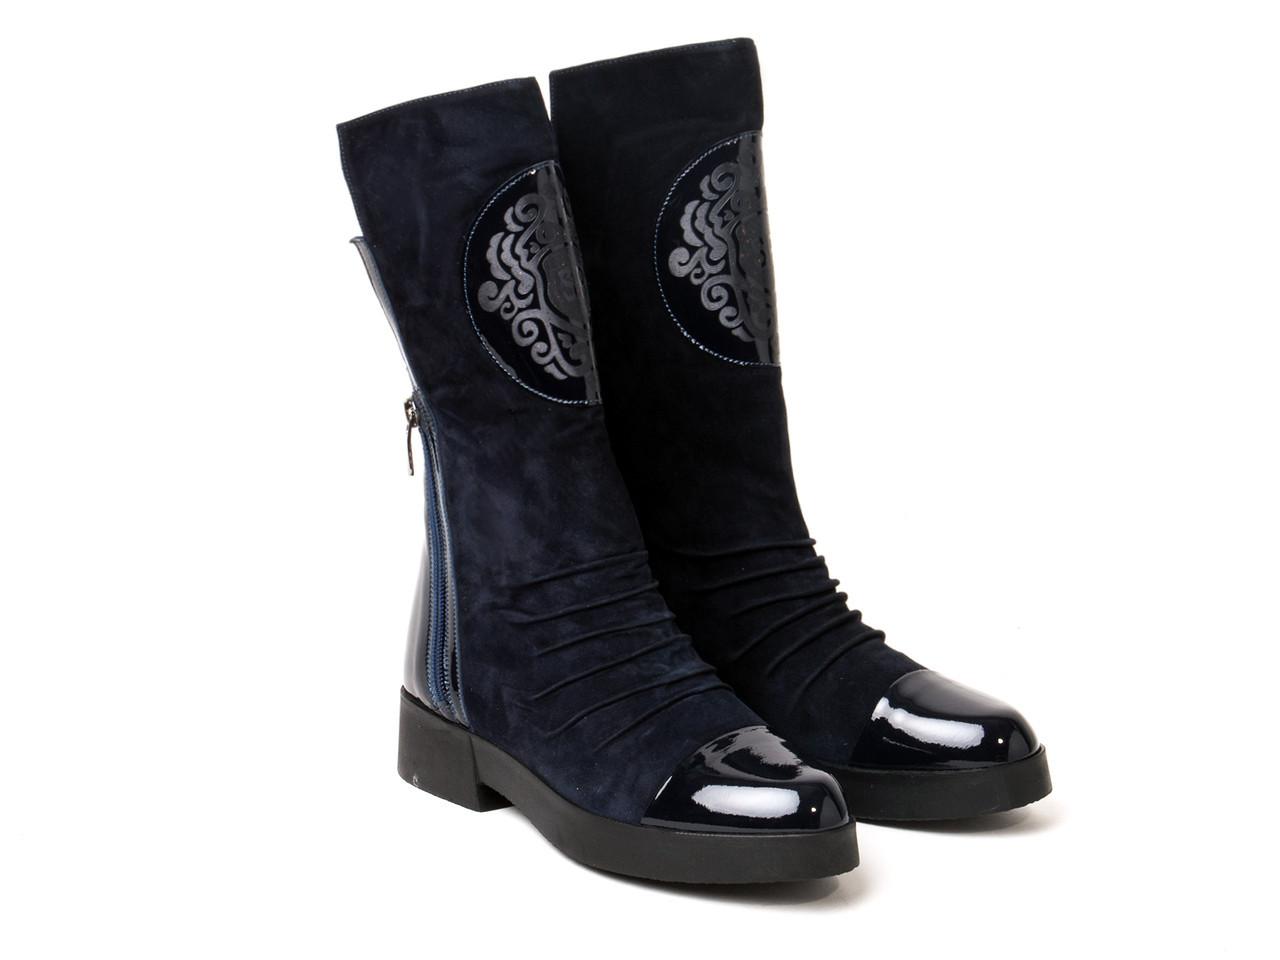 Ботинки Etor 4987-7235 36 синие